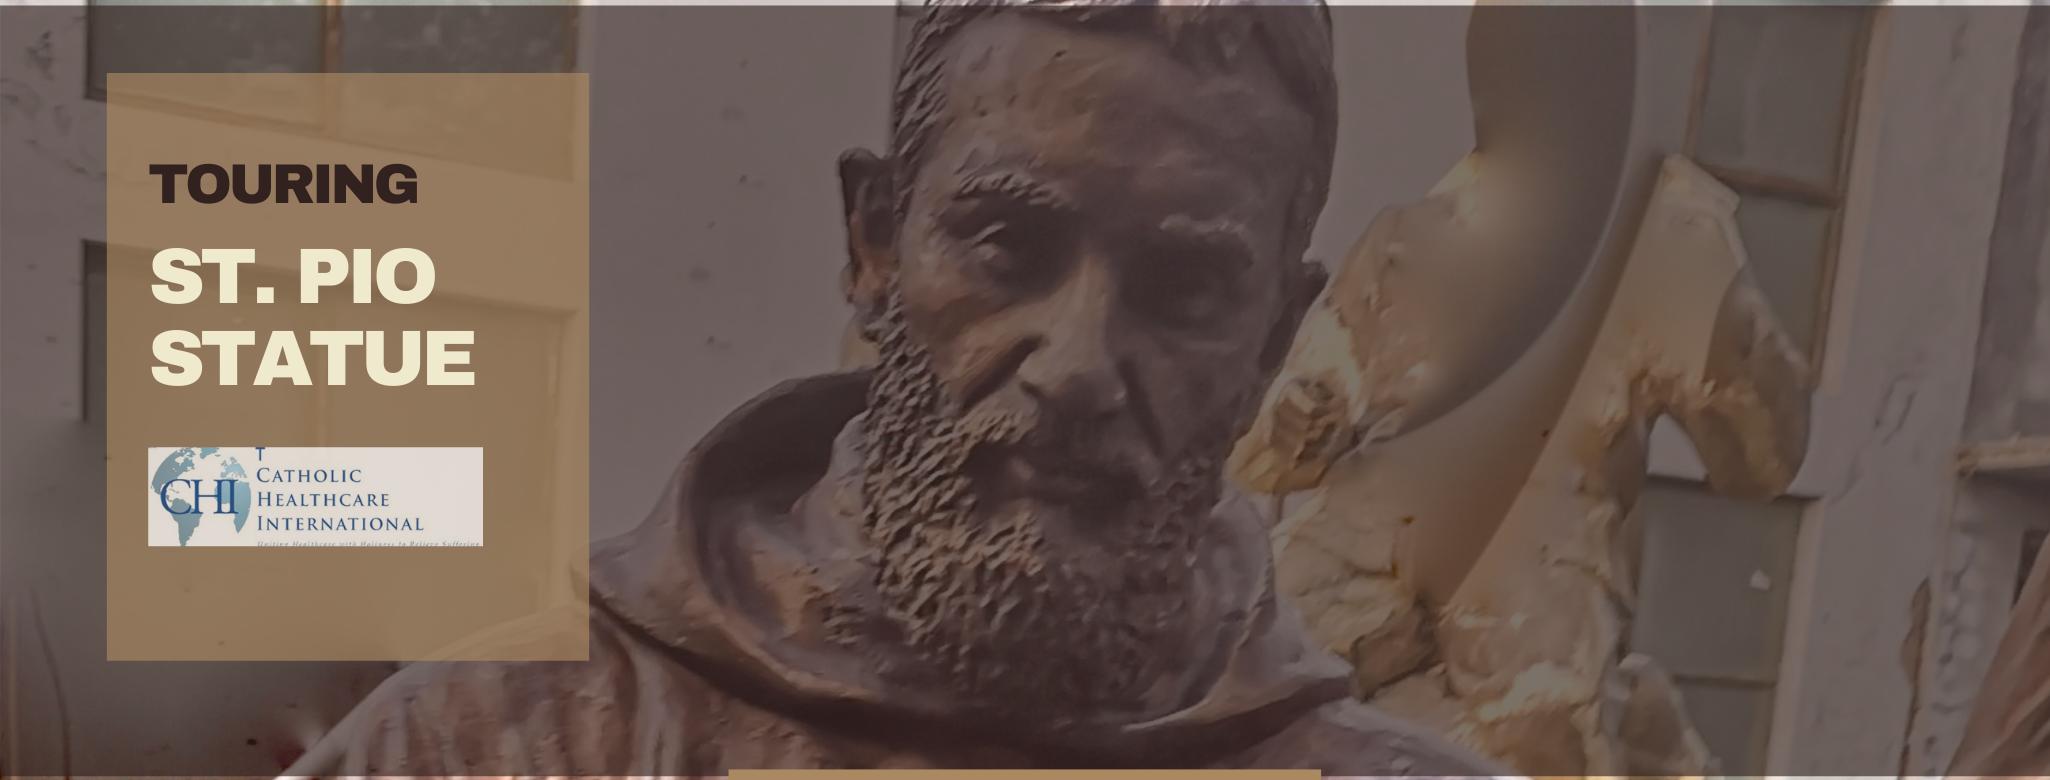 St Padre Pio Statue tour